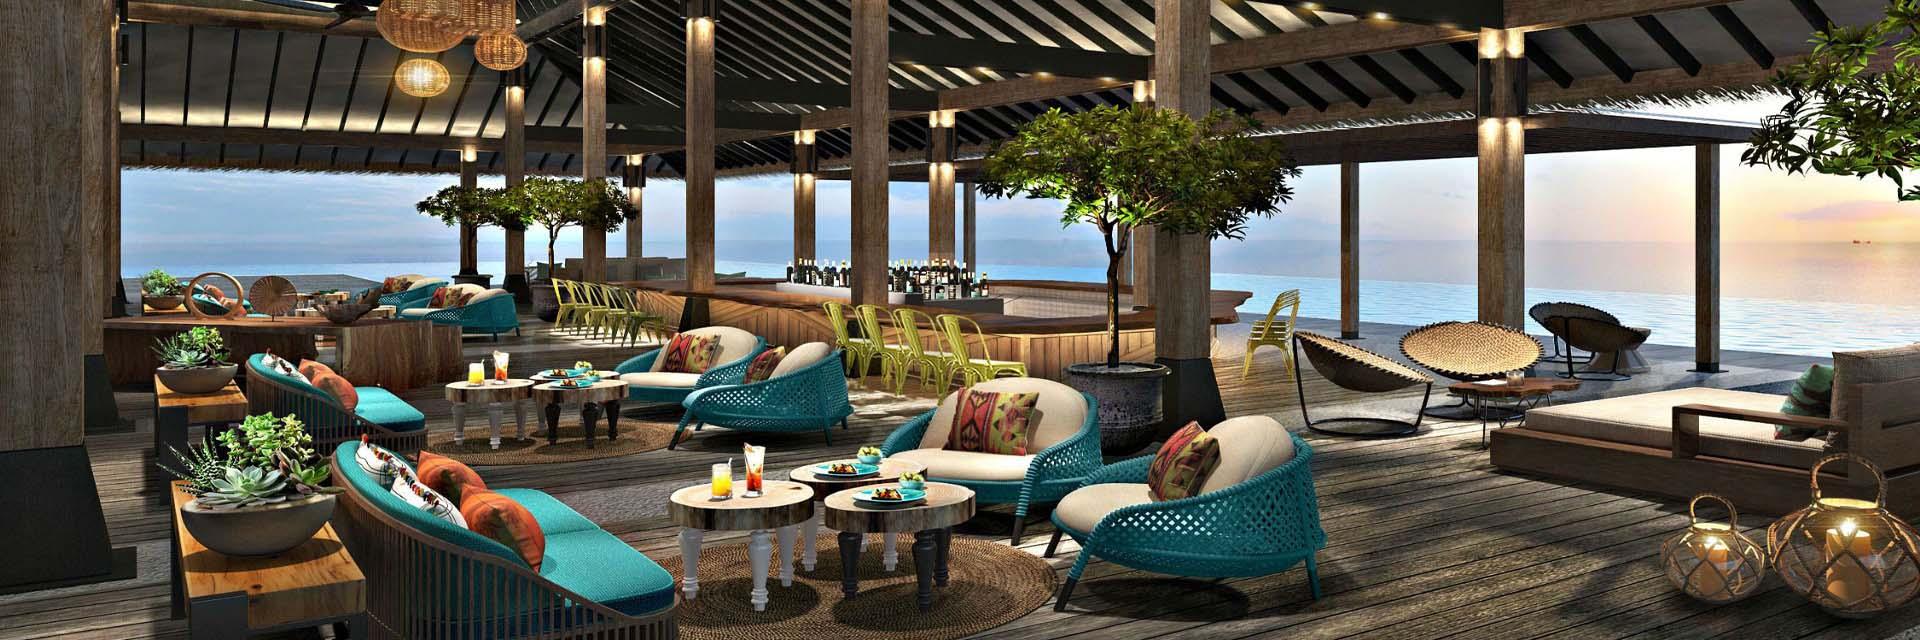 grand-park-kodhipparu-maldives-dining